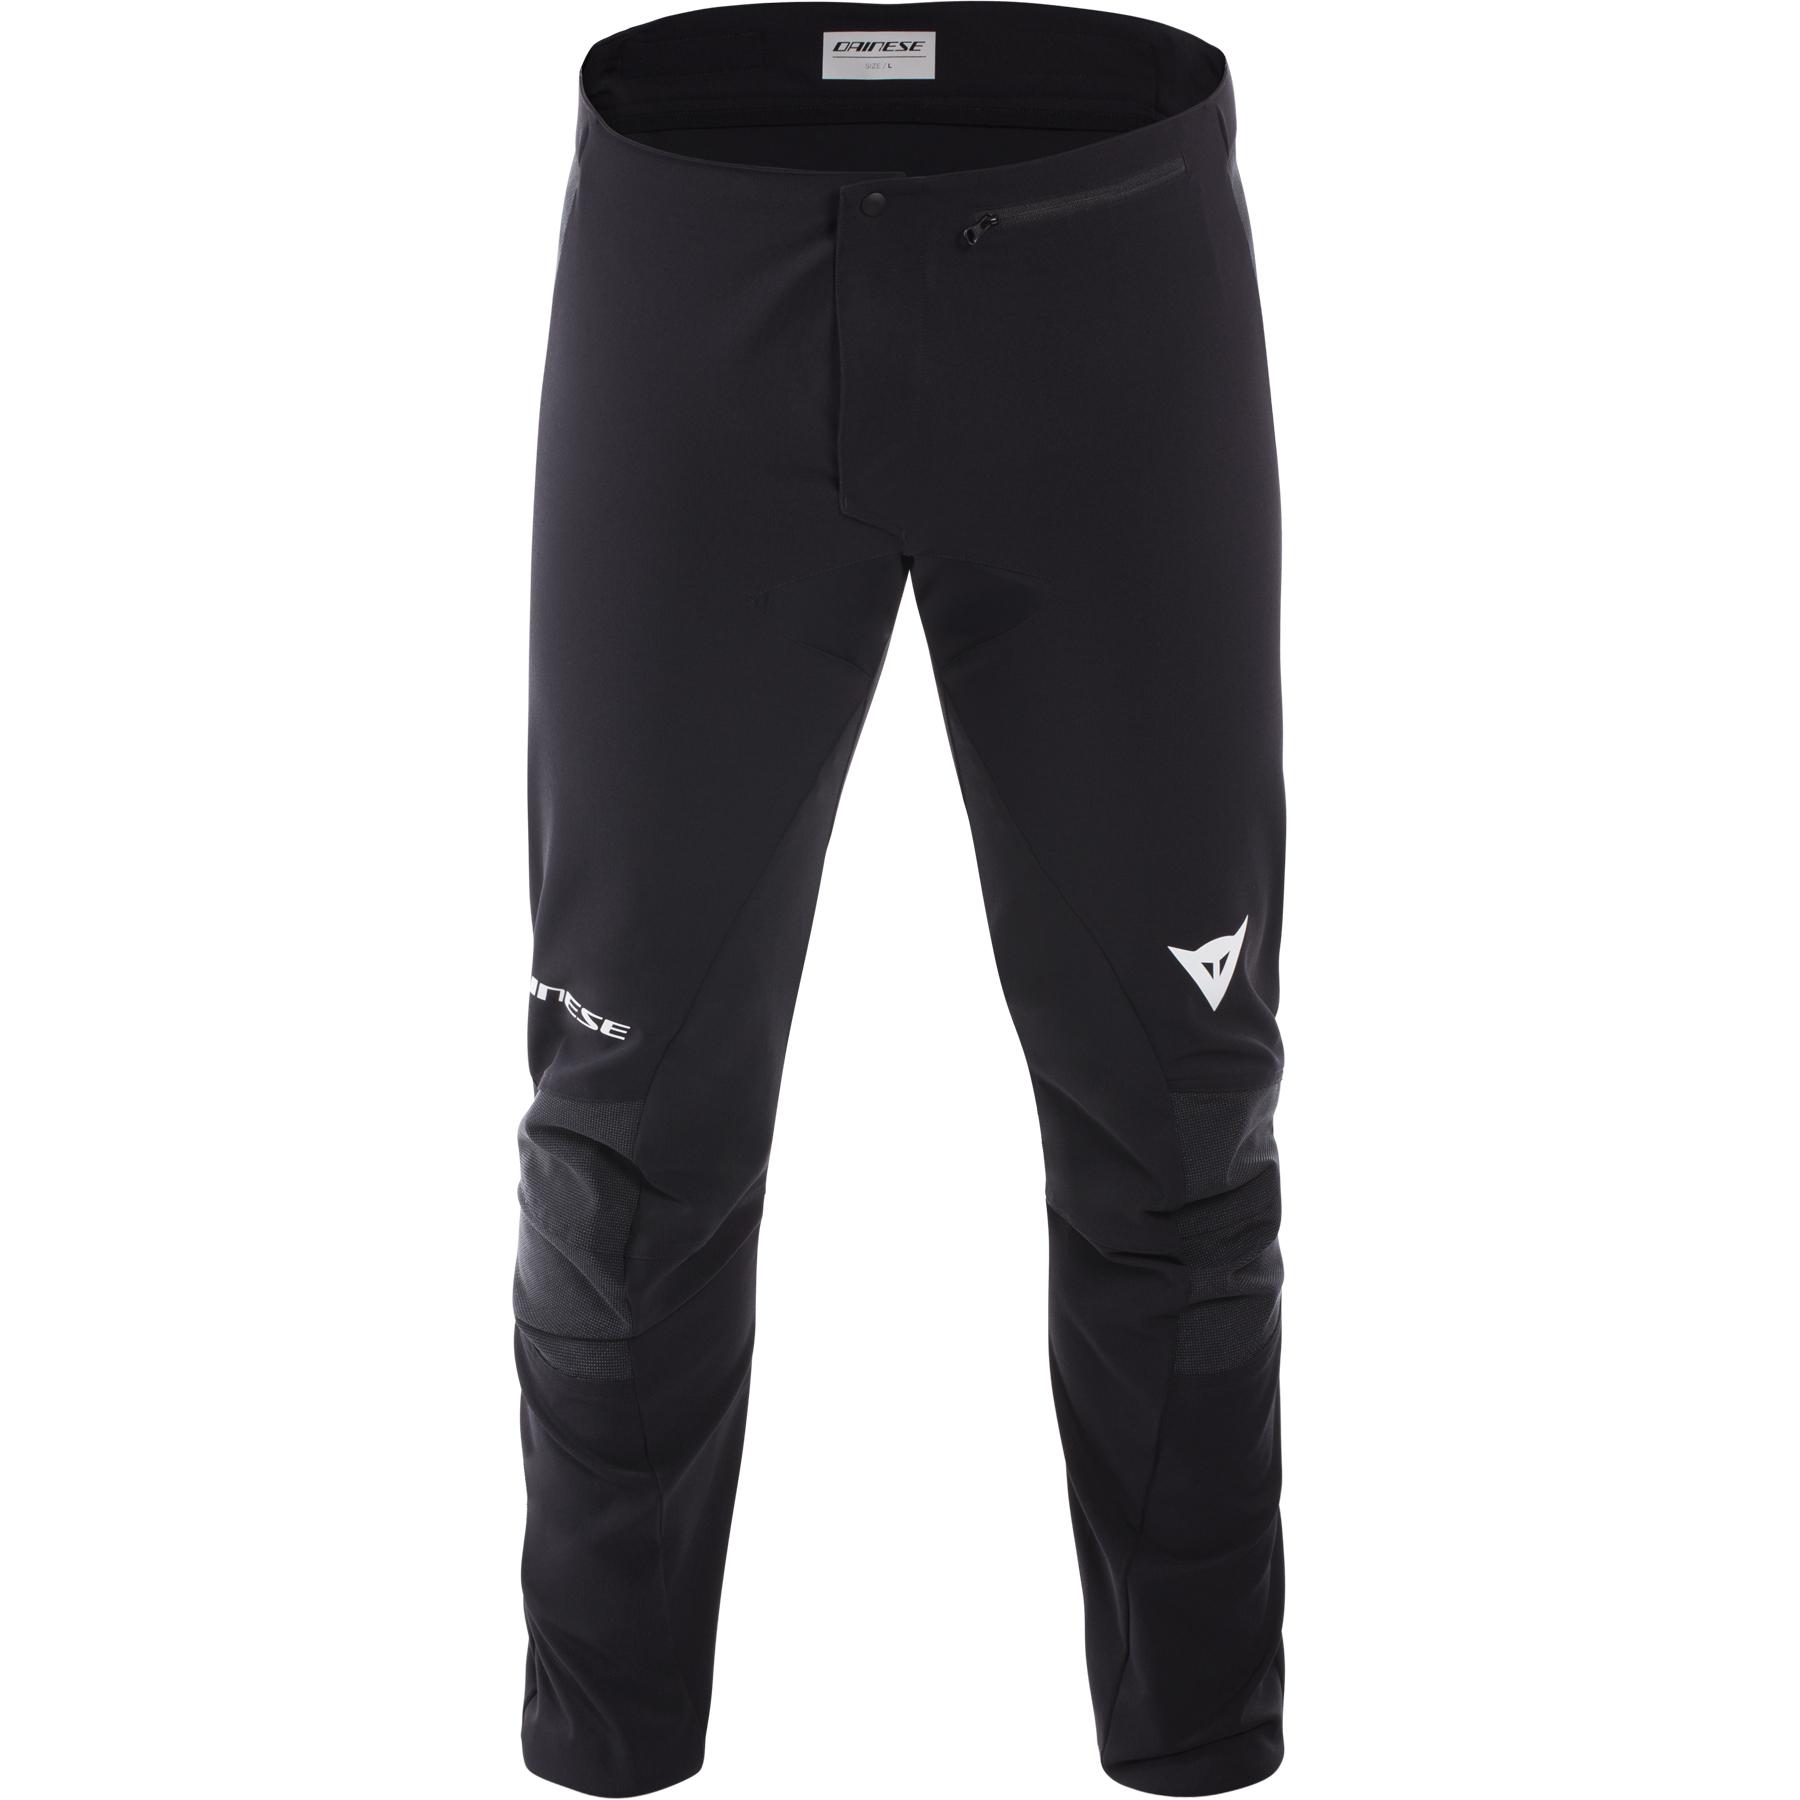 Dainese HG Pants 1 Downhill - black